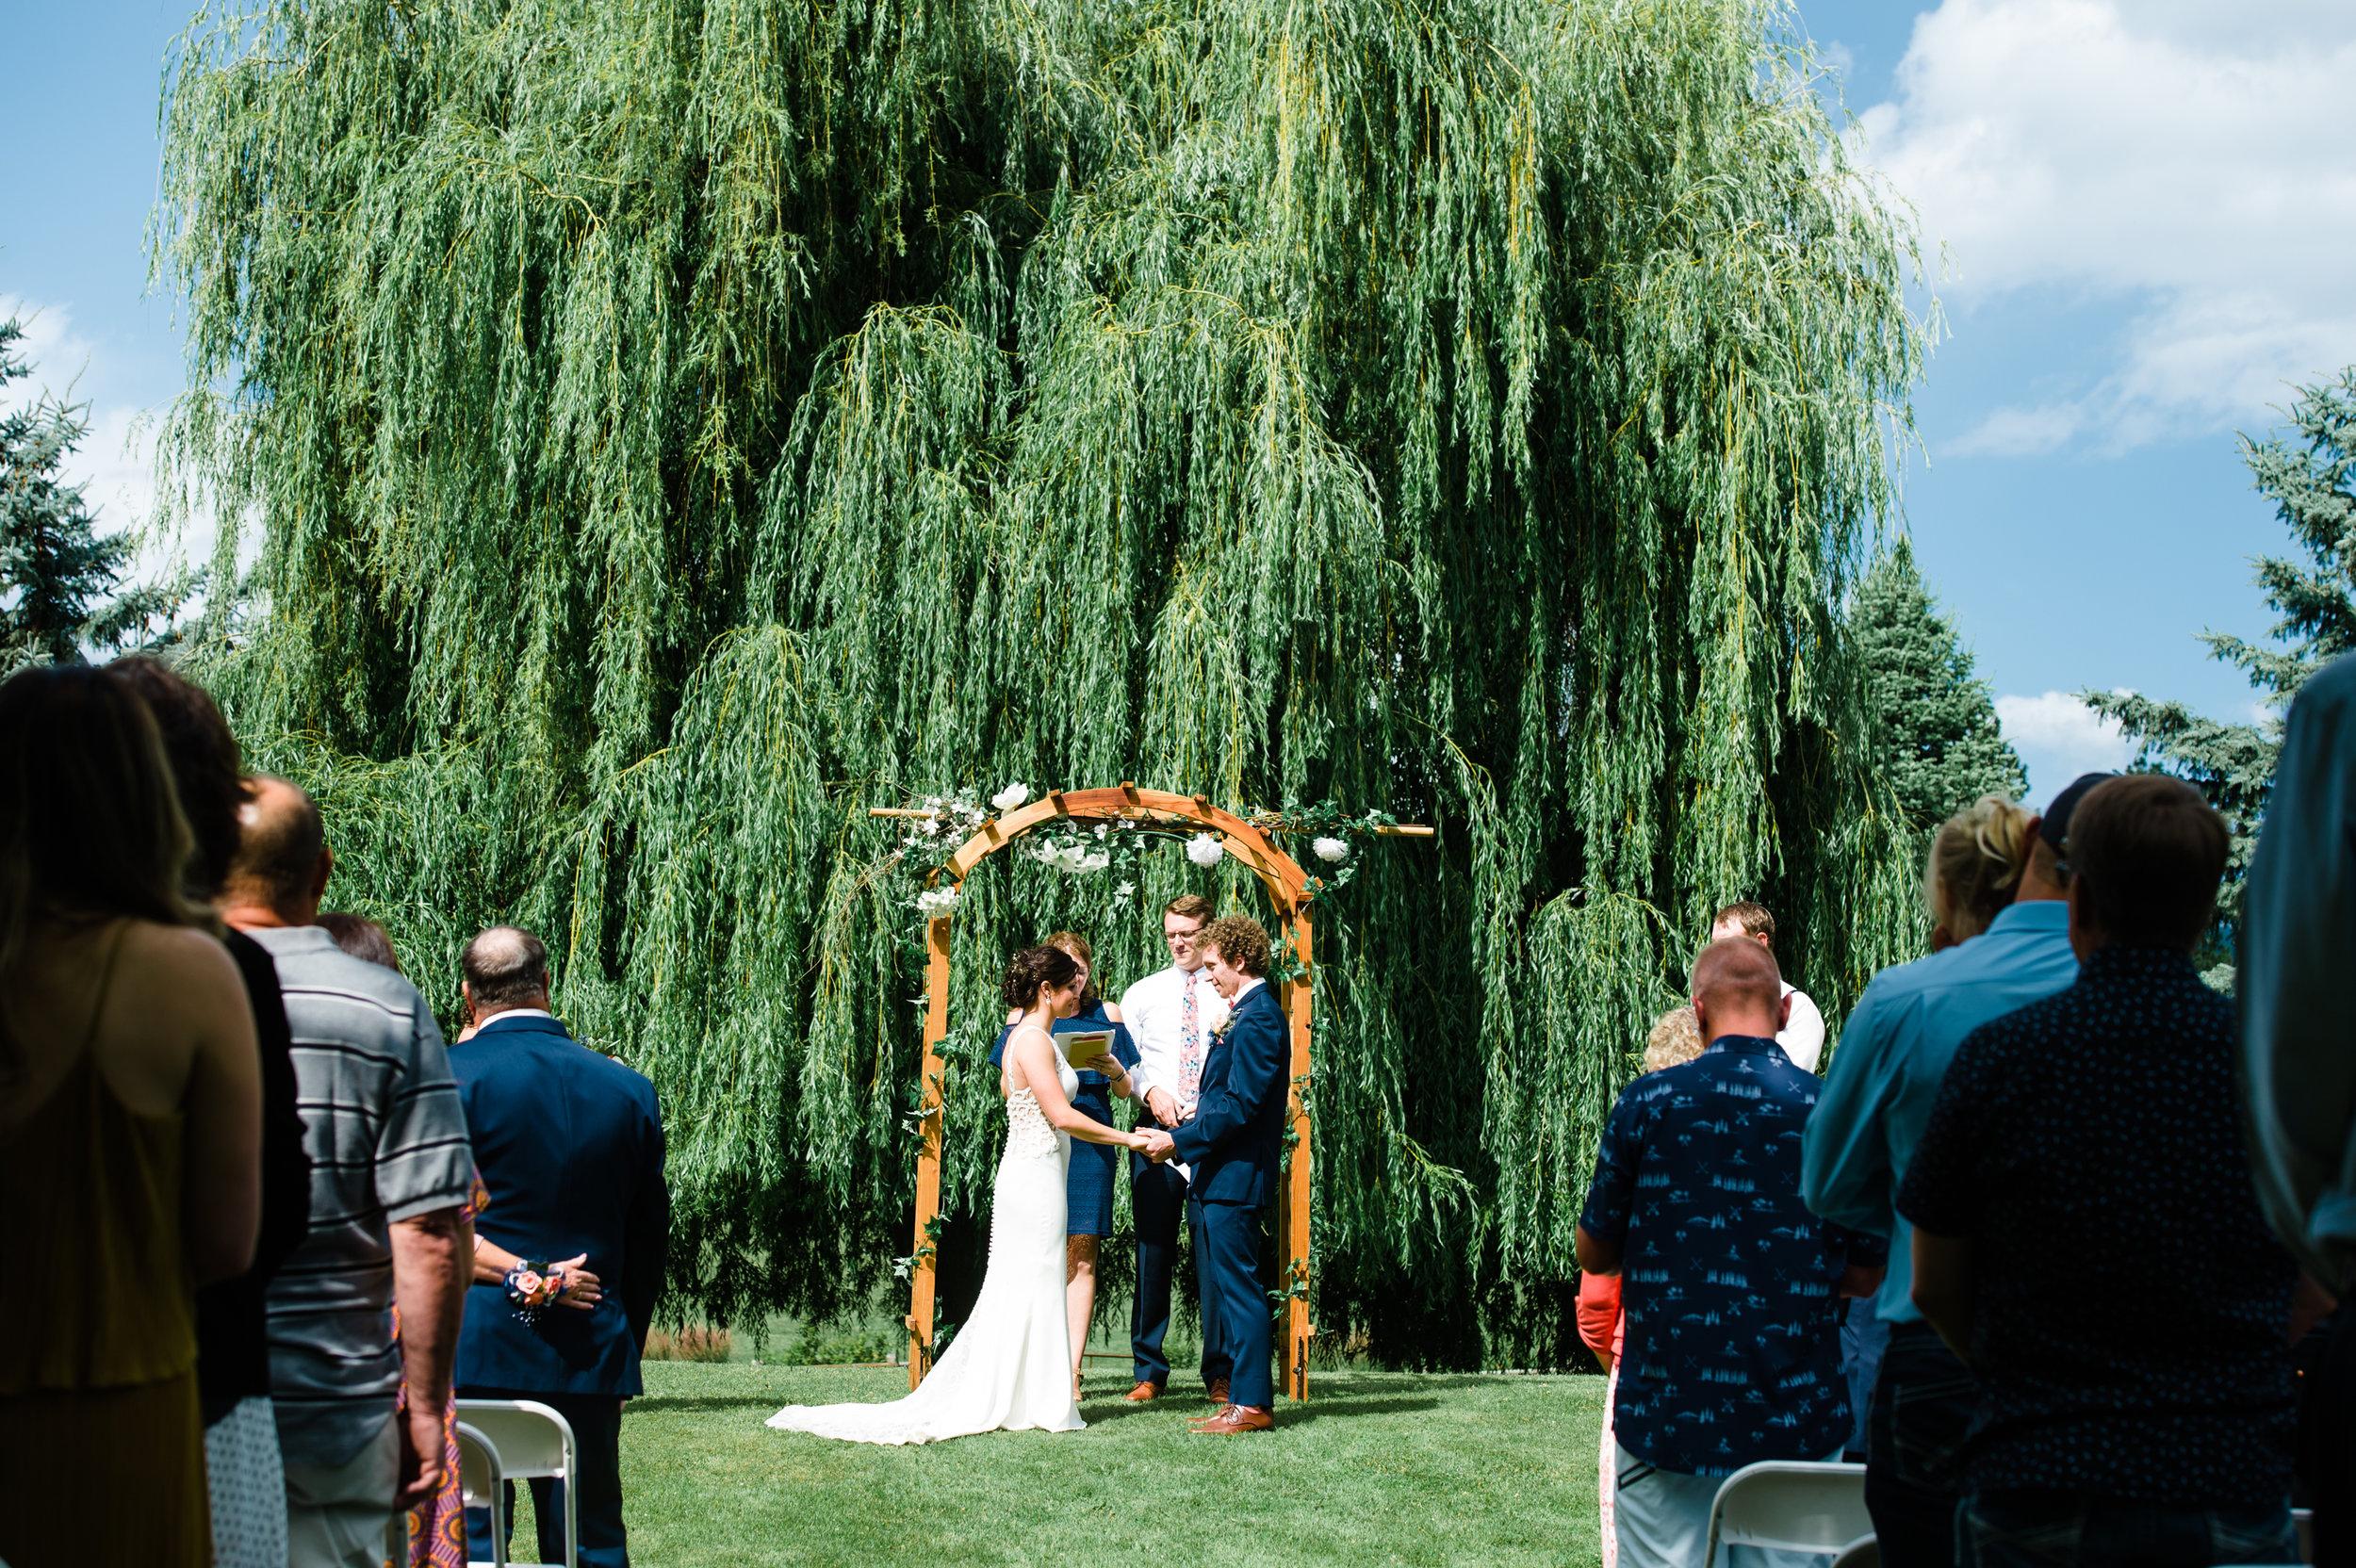 123The Barn at Finley Point Wedding_Montana Wedding Photographer_Katy & Bryce_July 20, 2019-852.jpg